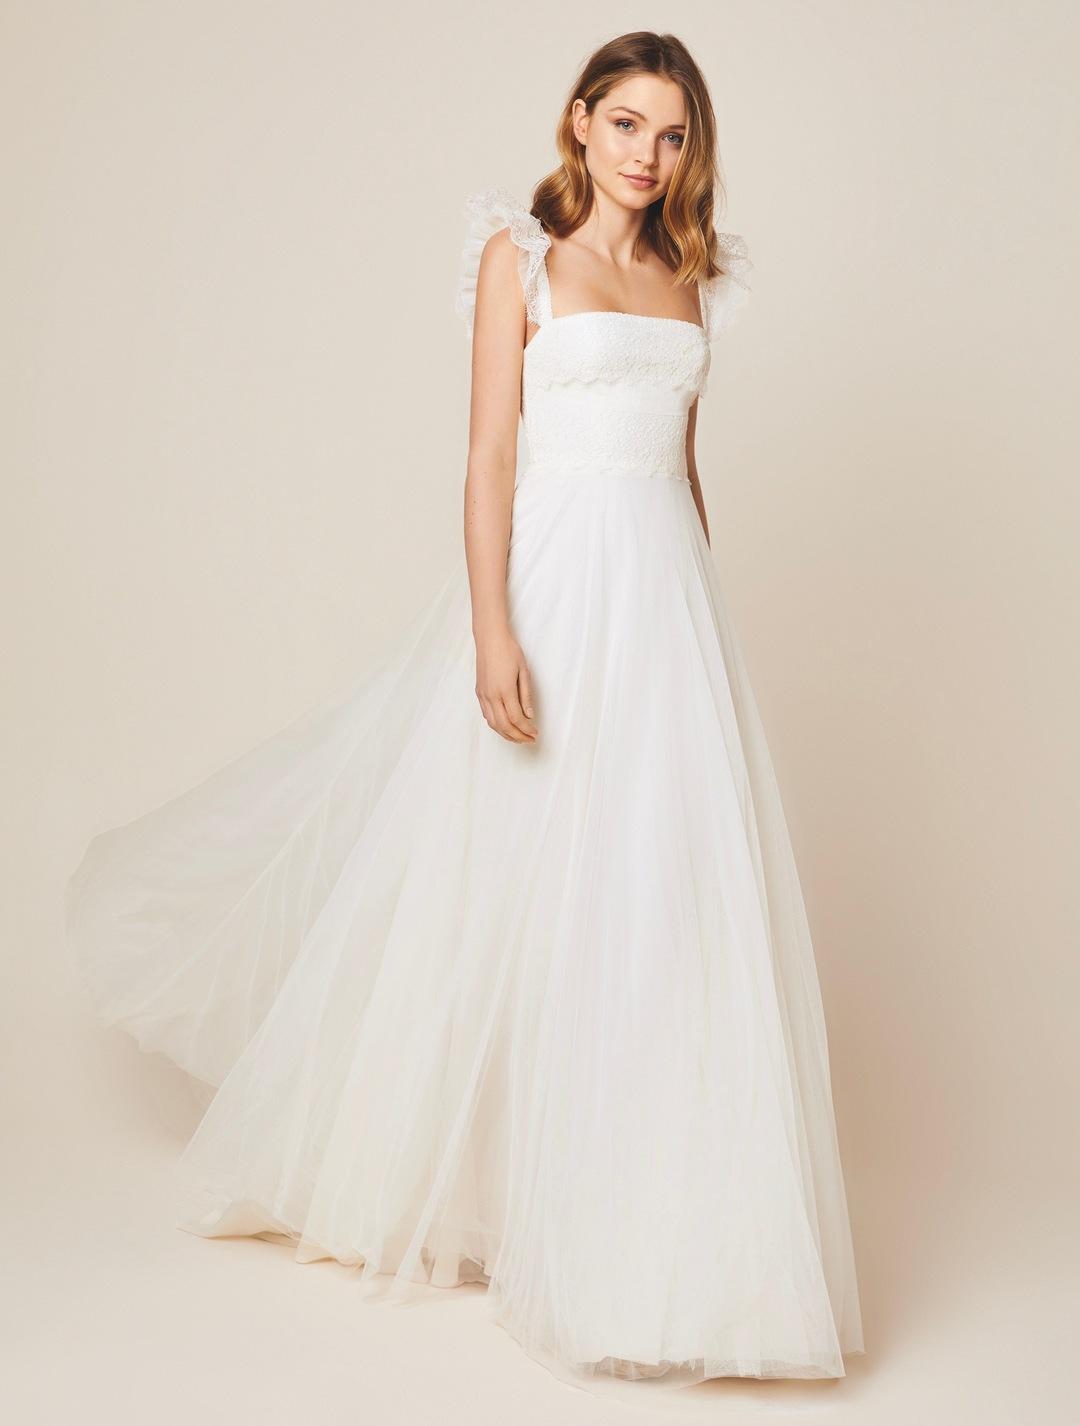 967 dress photo